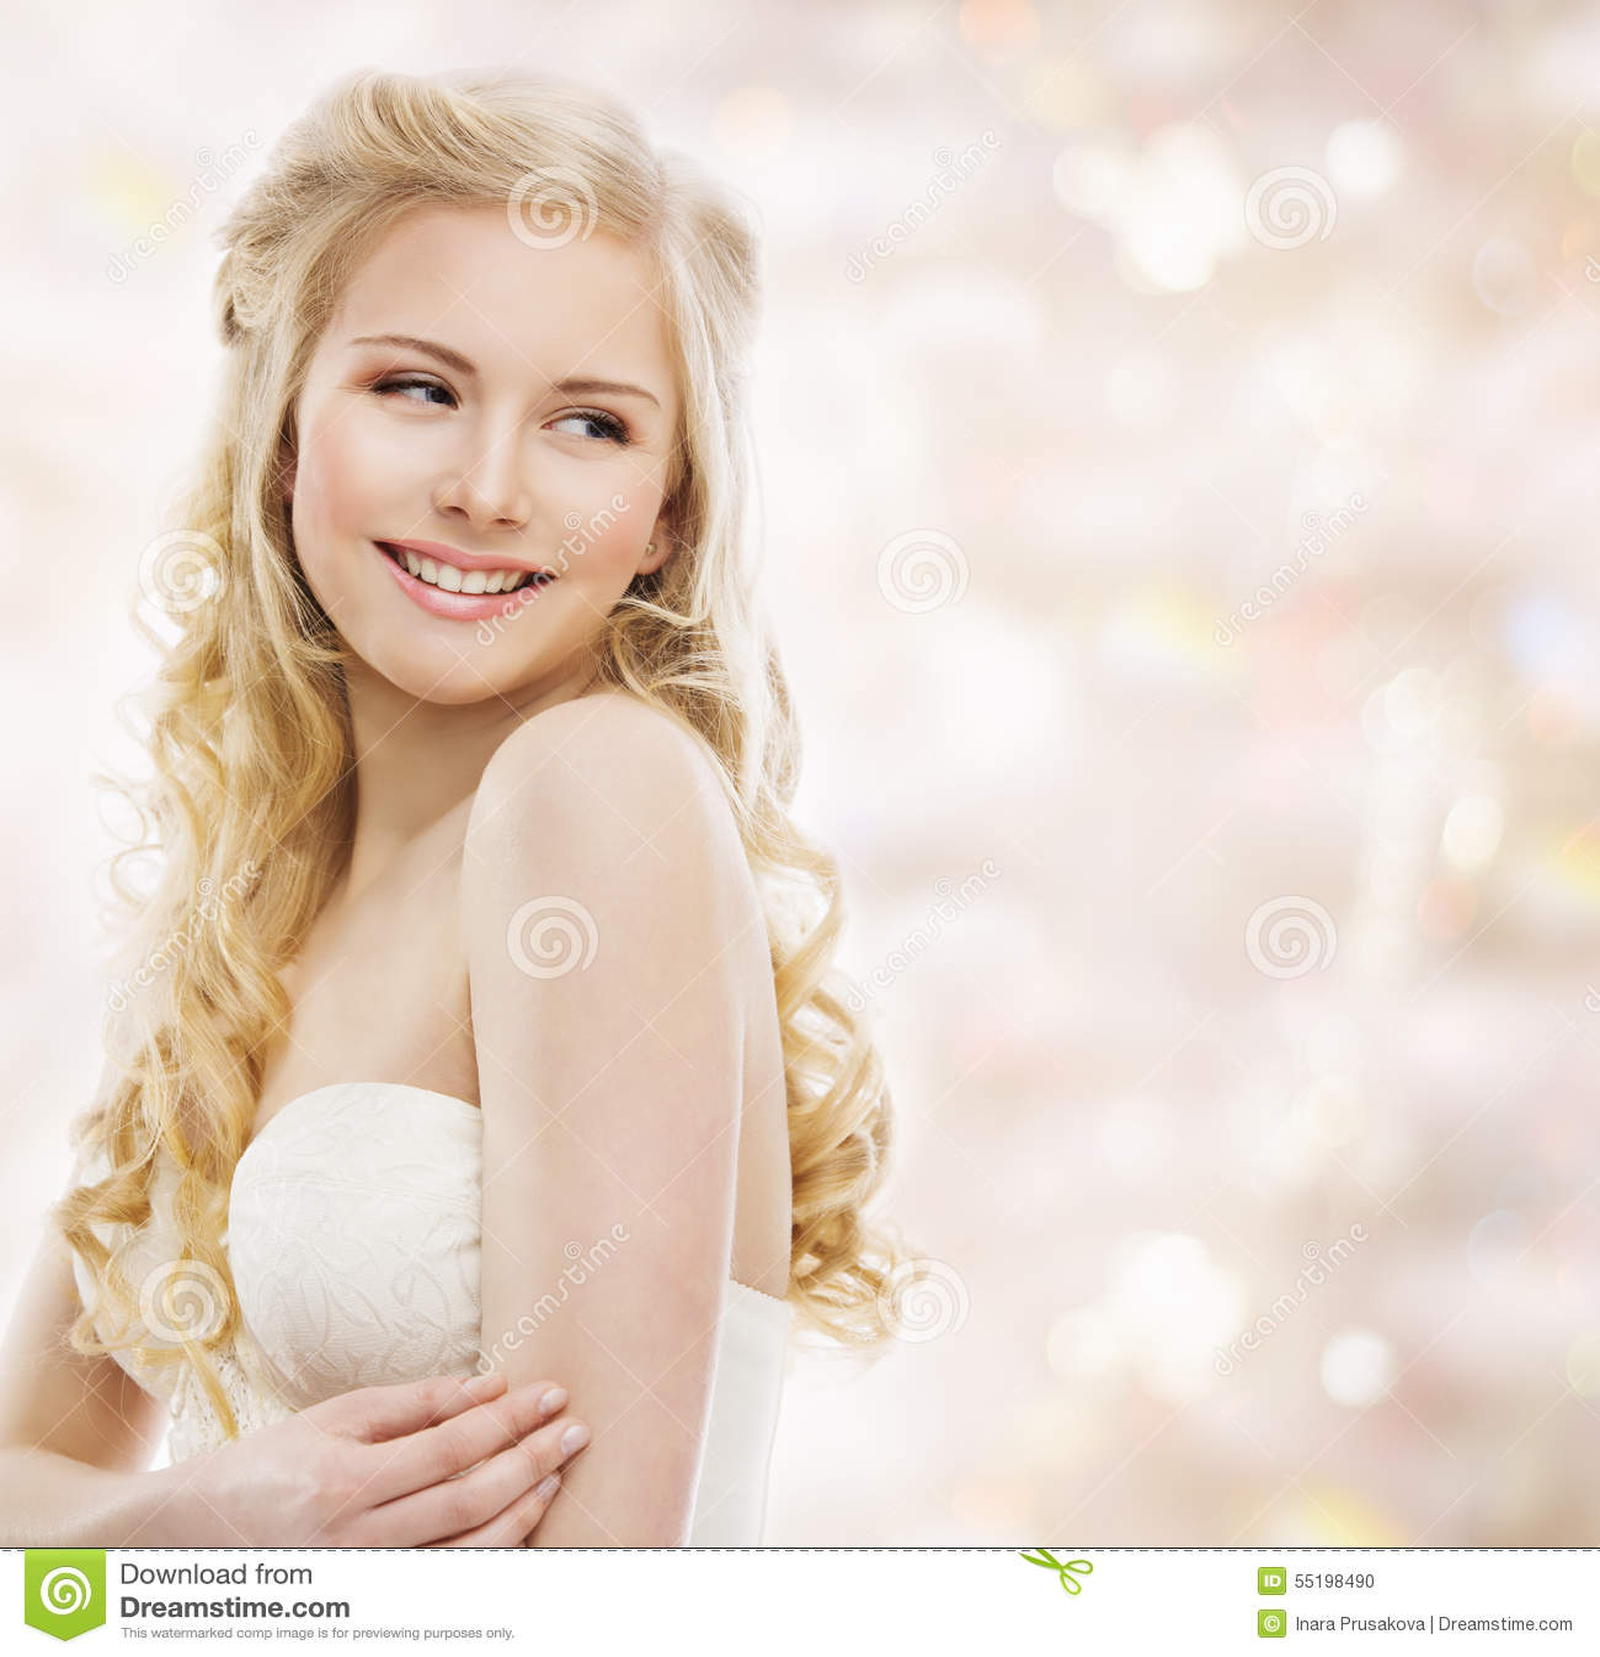 Pelo largo rubio de la mujer, modelo de moda Portrait, muchacha sonriente